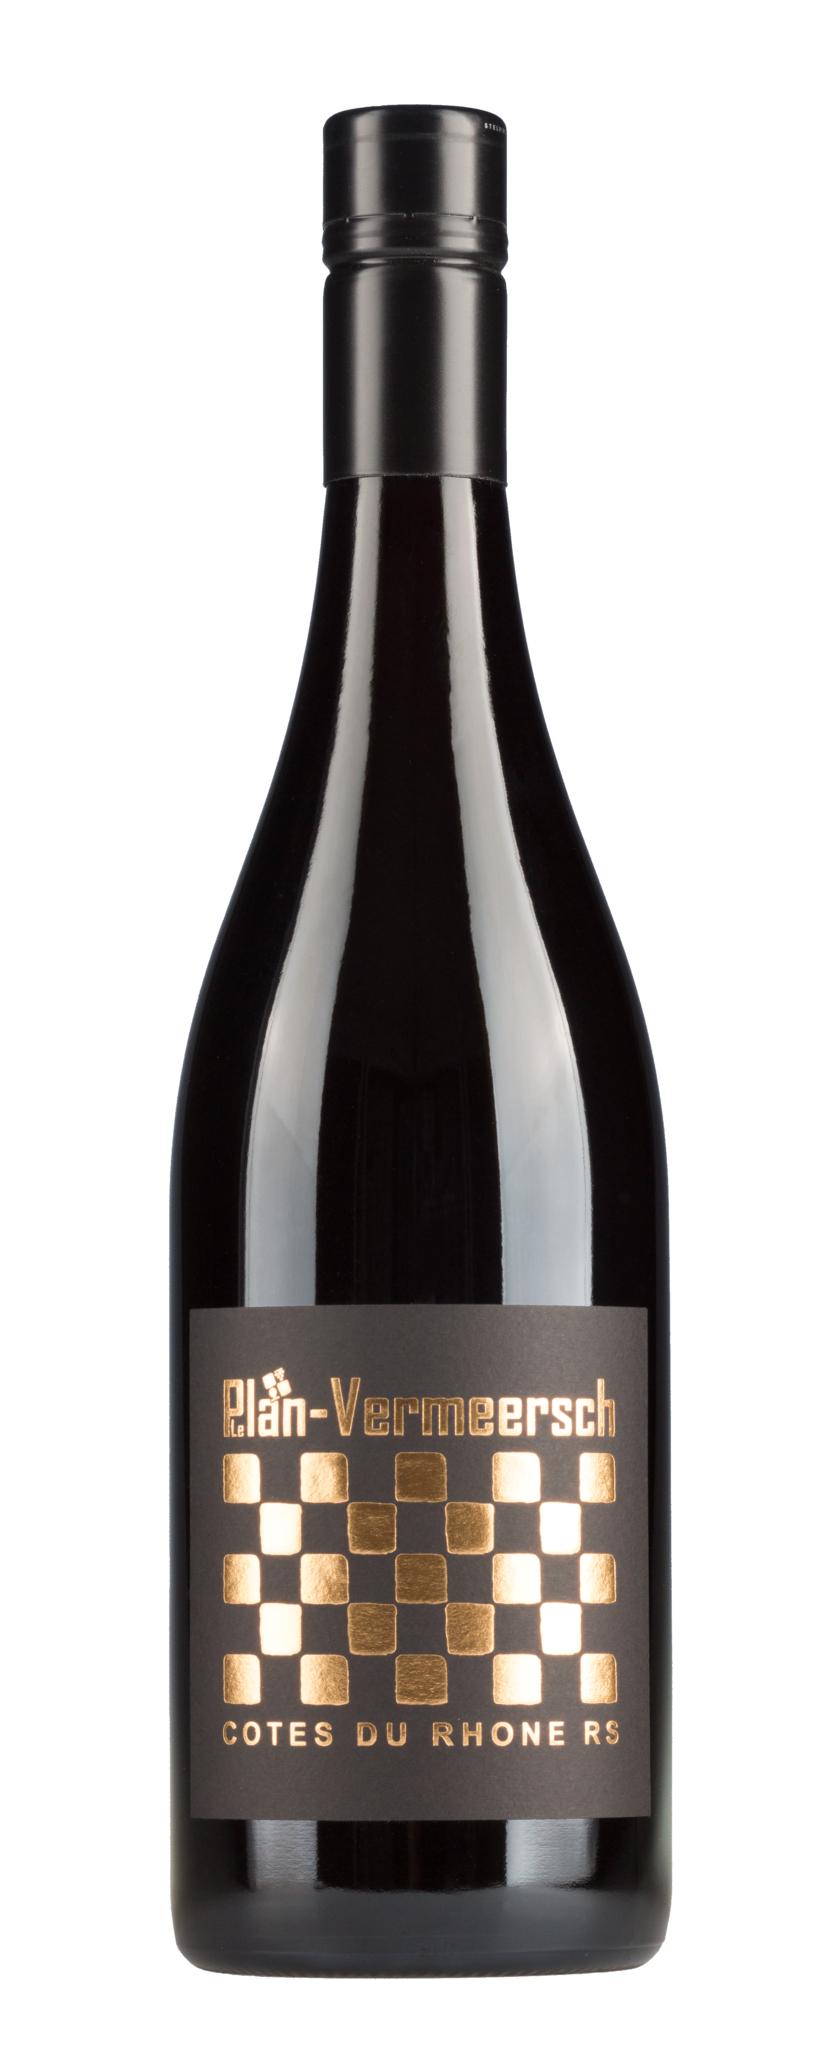 LePlan Vermeesch, Rhône 2019 Côtes-du-Rhône rouge RS, Plan-Vermeersch